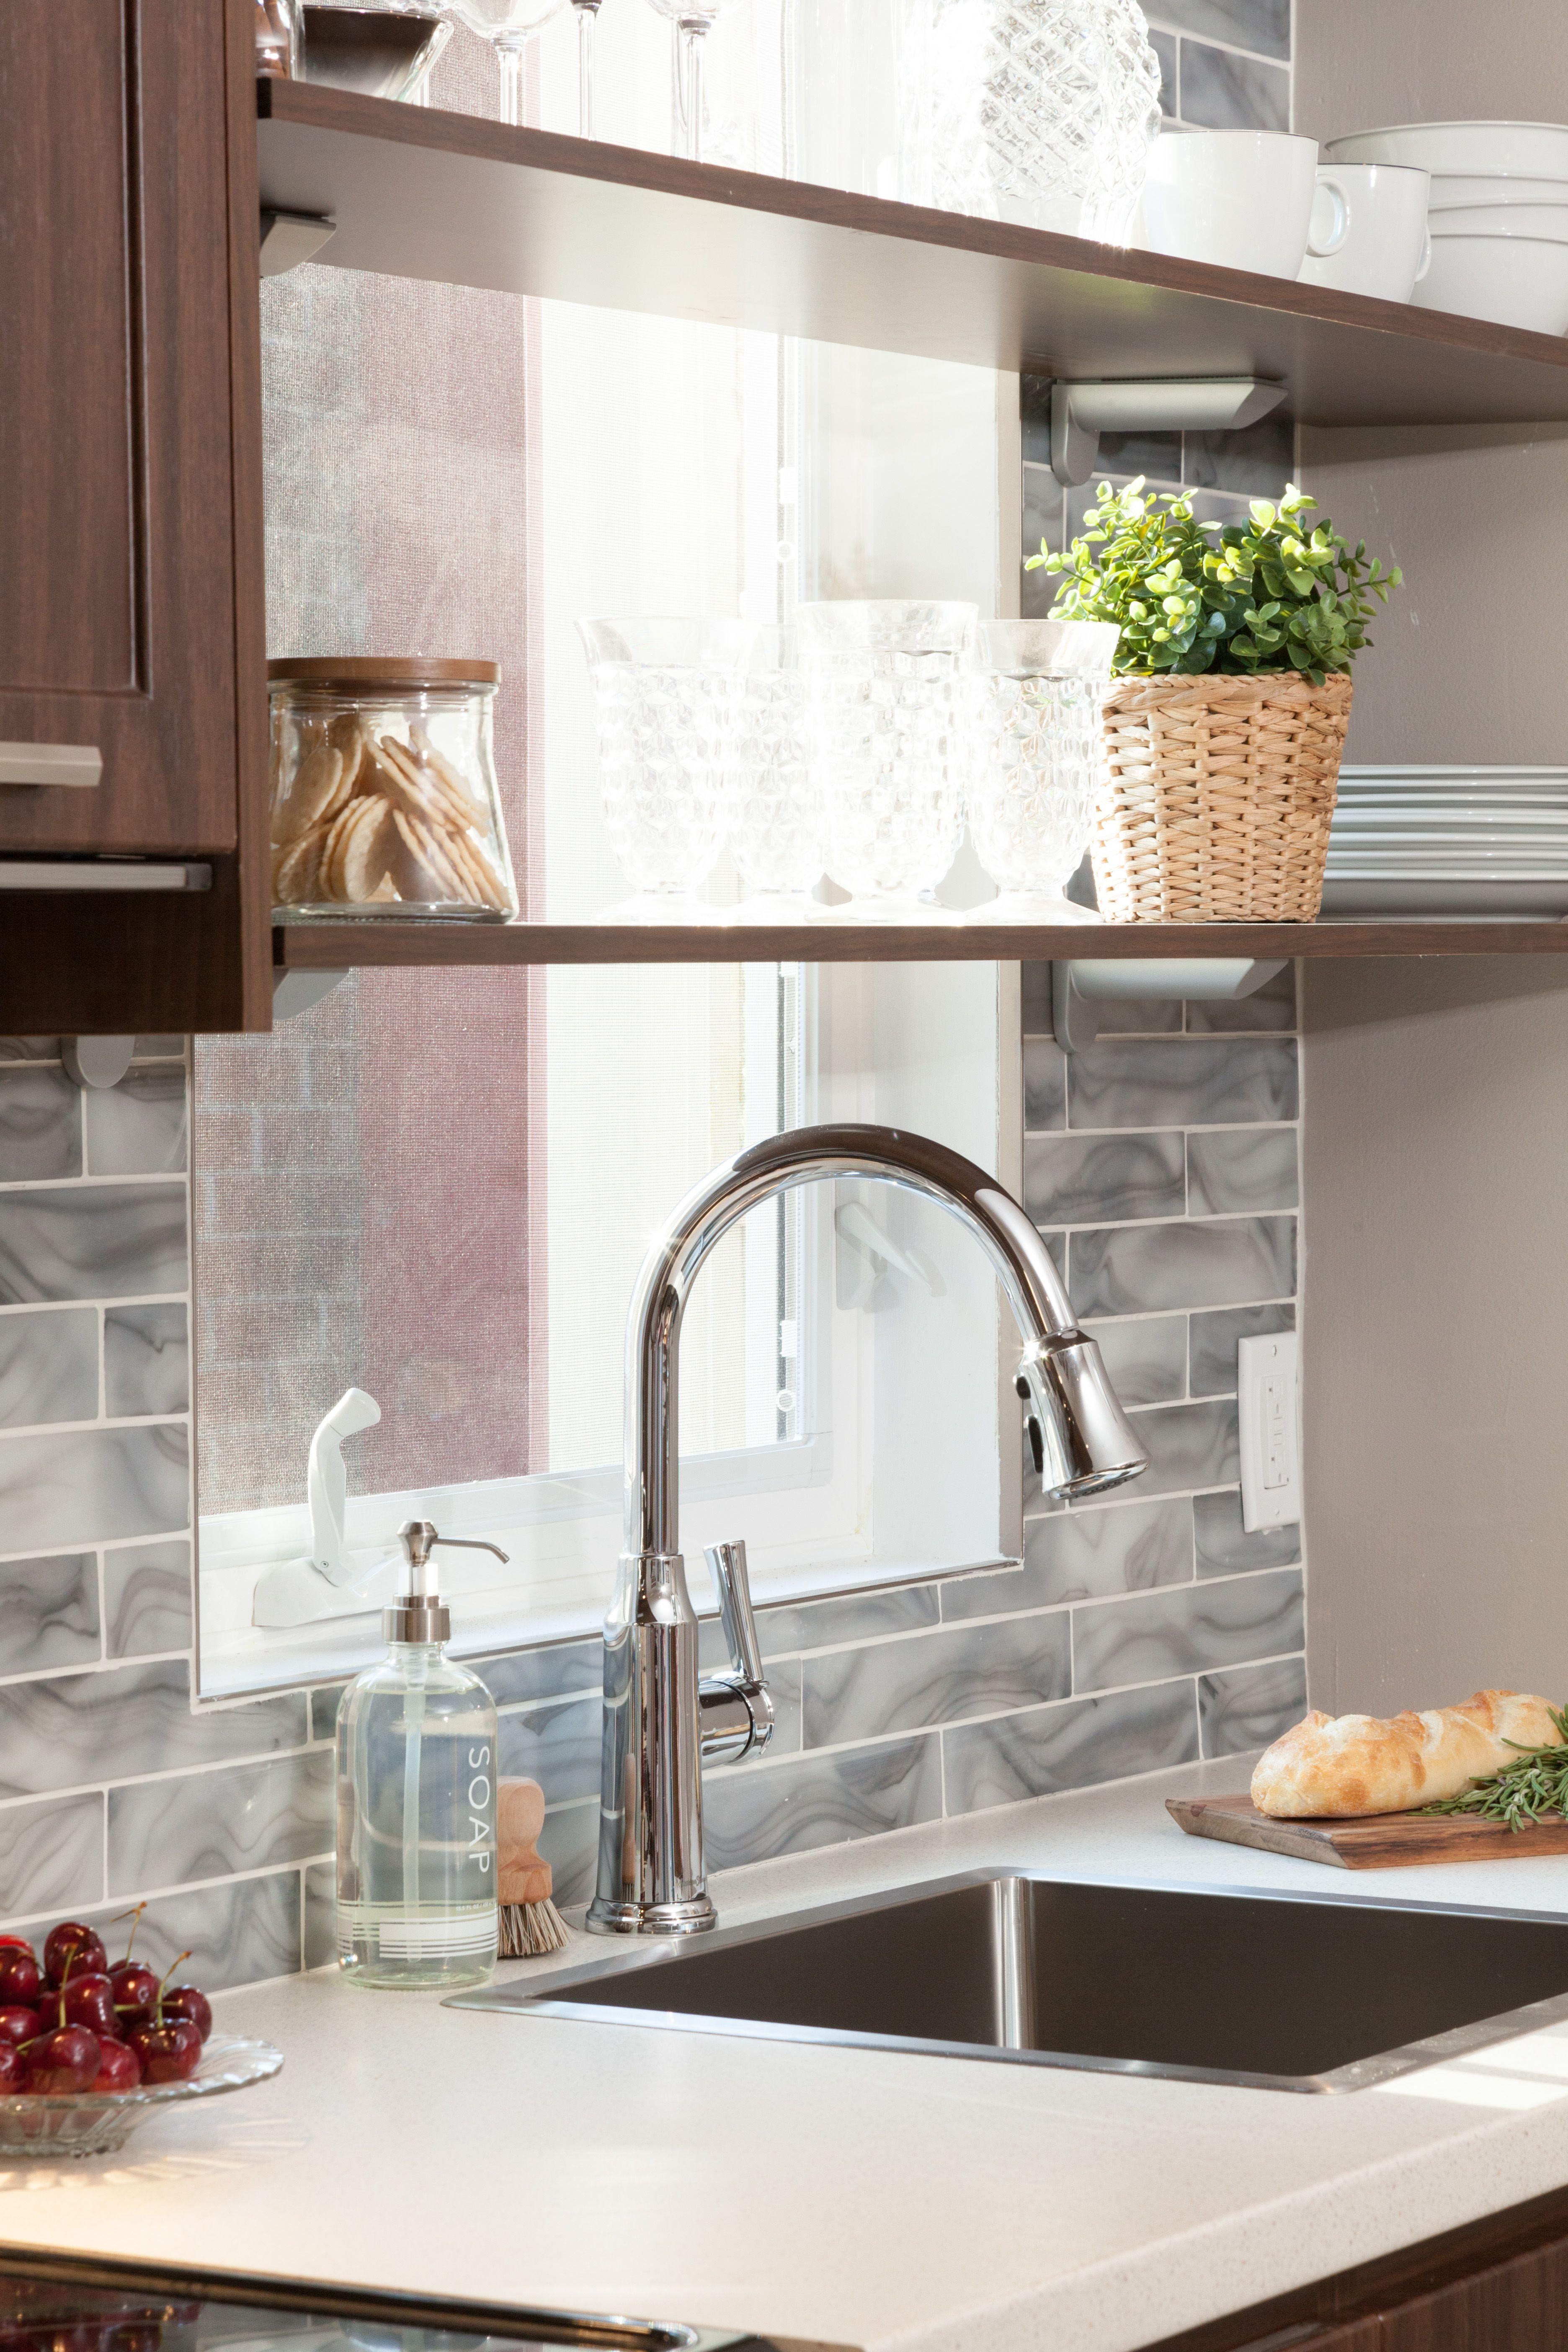 Backsplash around kitchen window  income property andrew u maria  income property shelves and glass